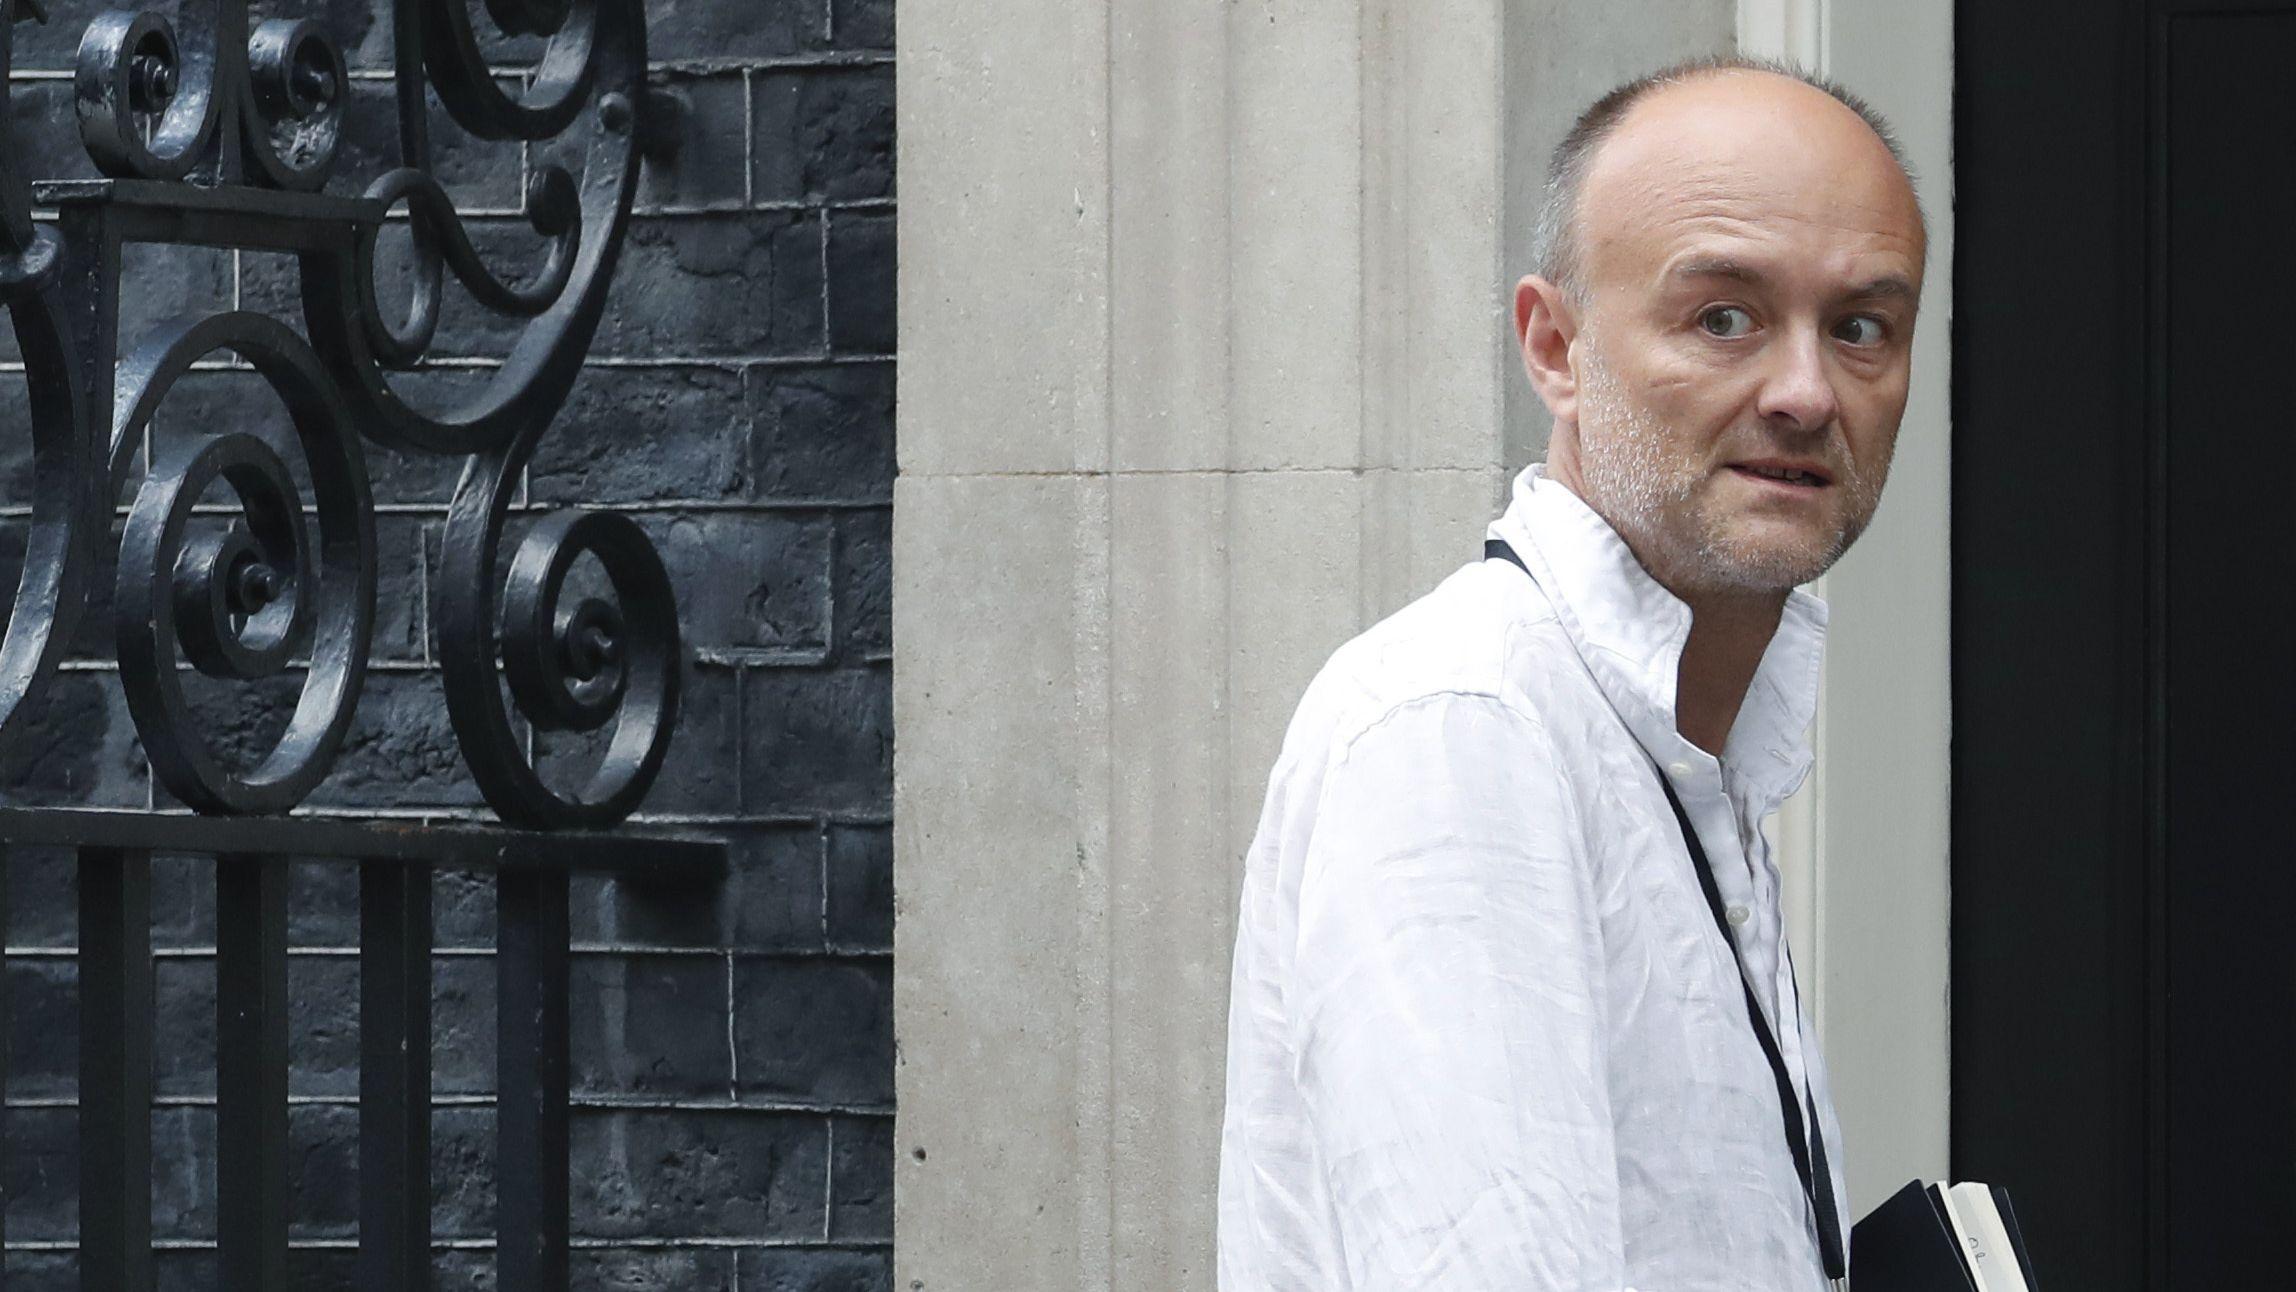 Dominic Cummings: Wahlstratege und Berater von Boris Johnson